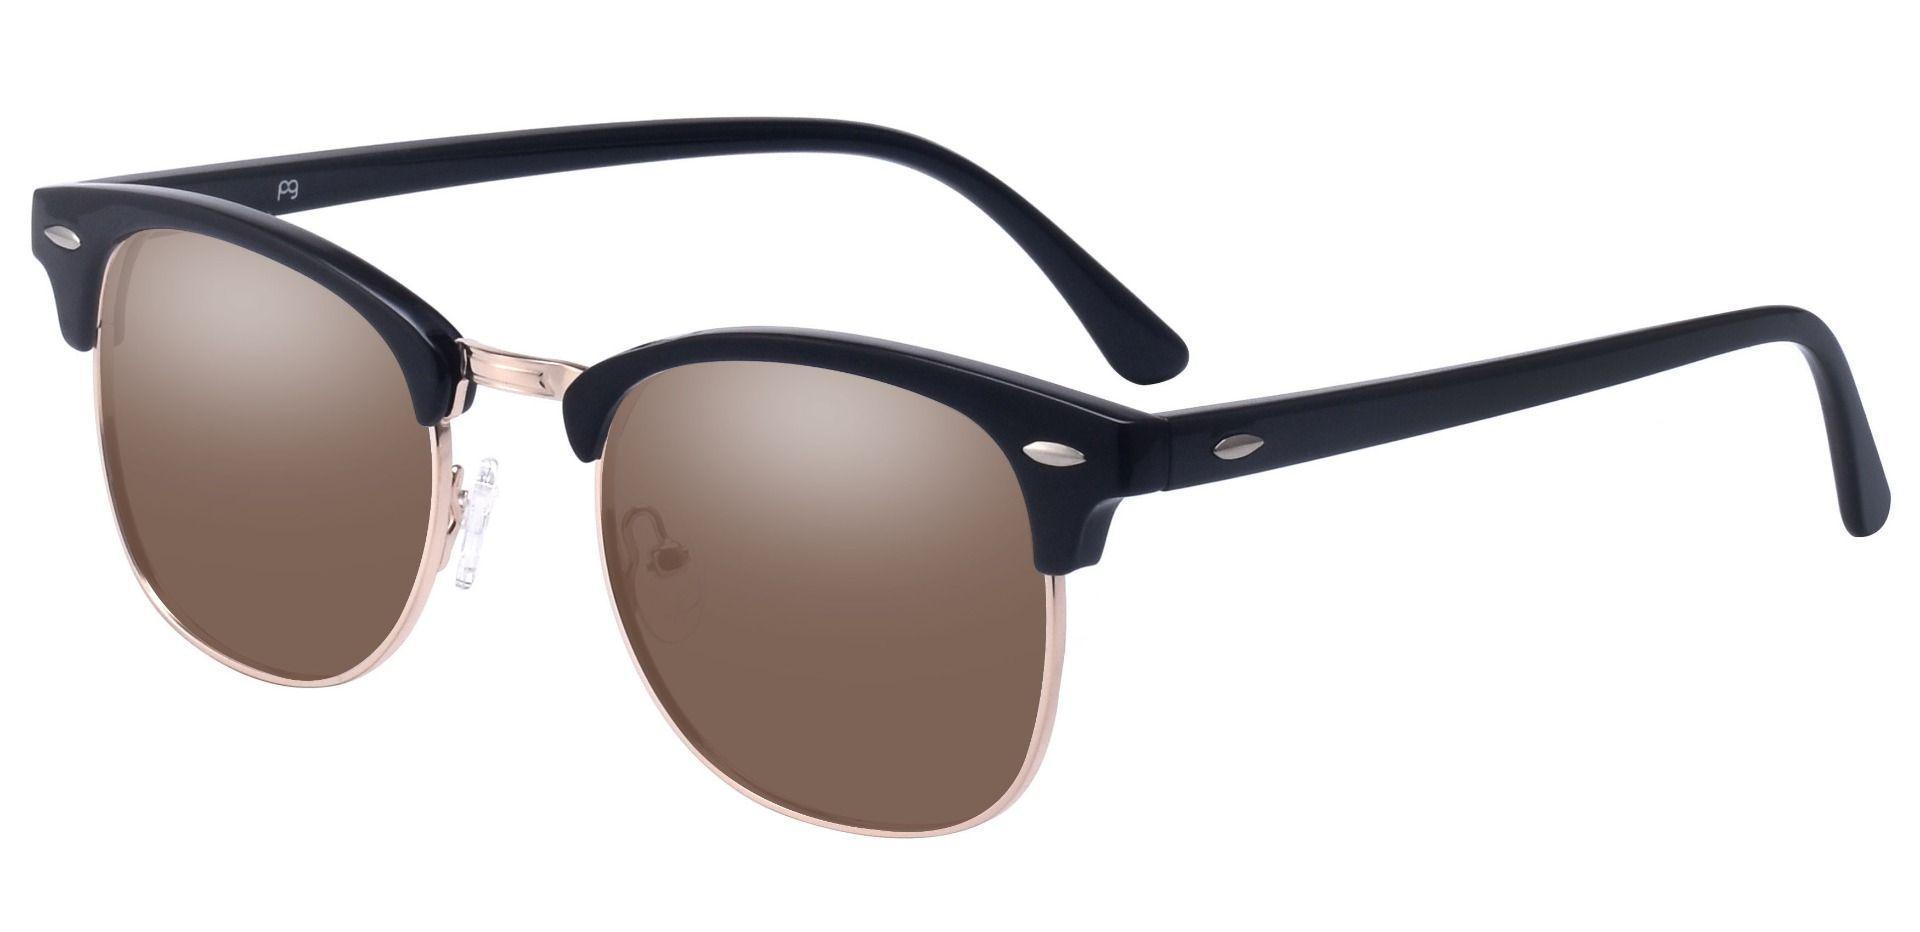 Salvatore Browline Prescription Sunglasses - Black Frame With Brown Lenses